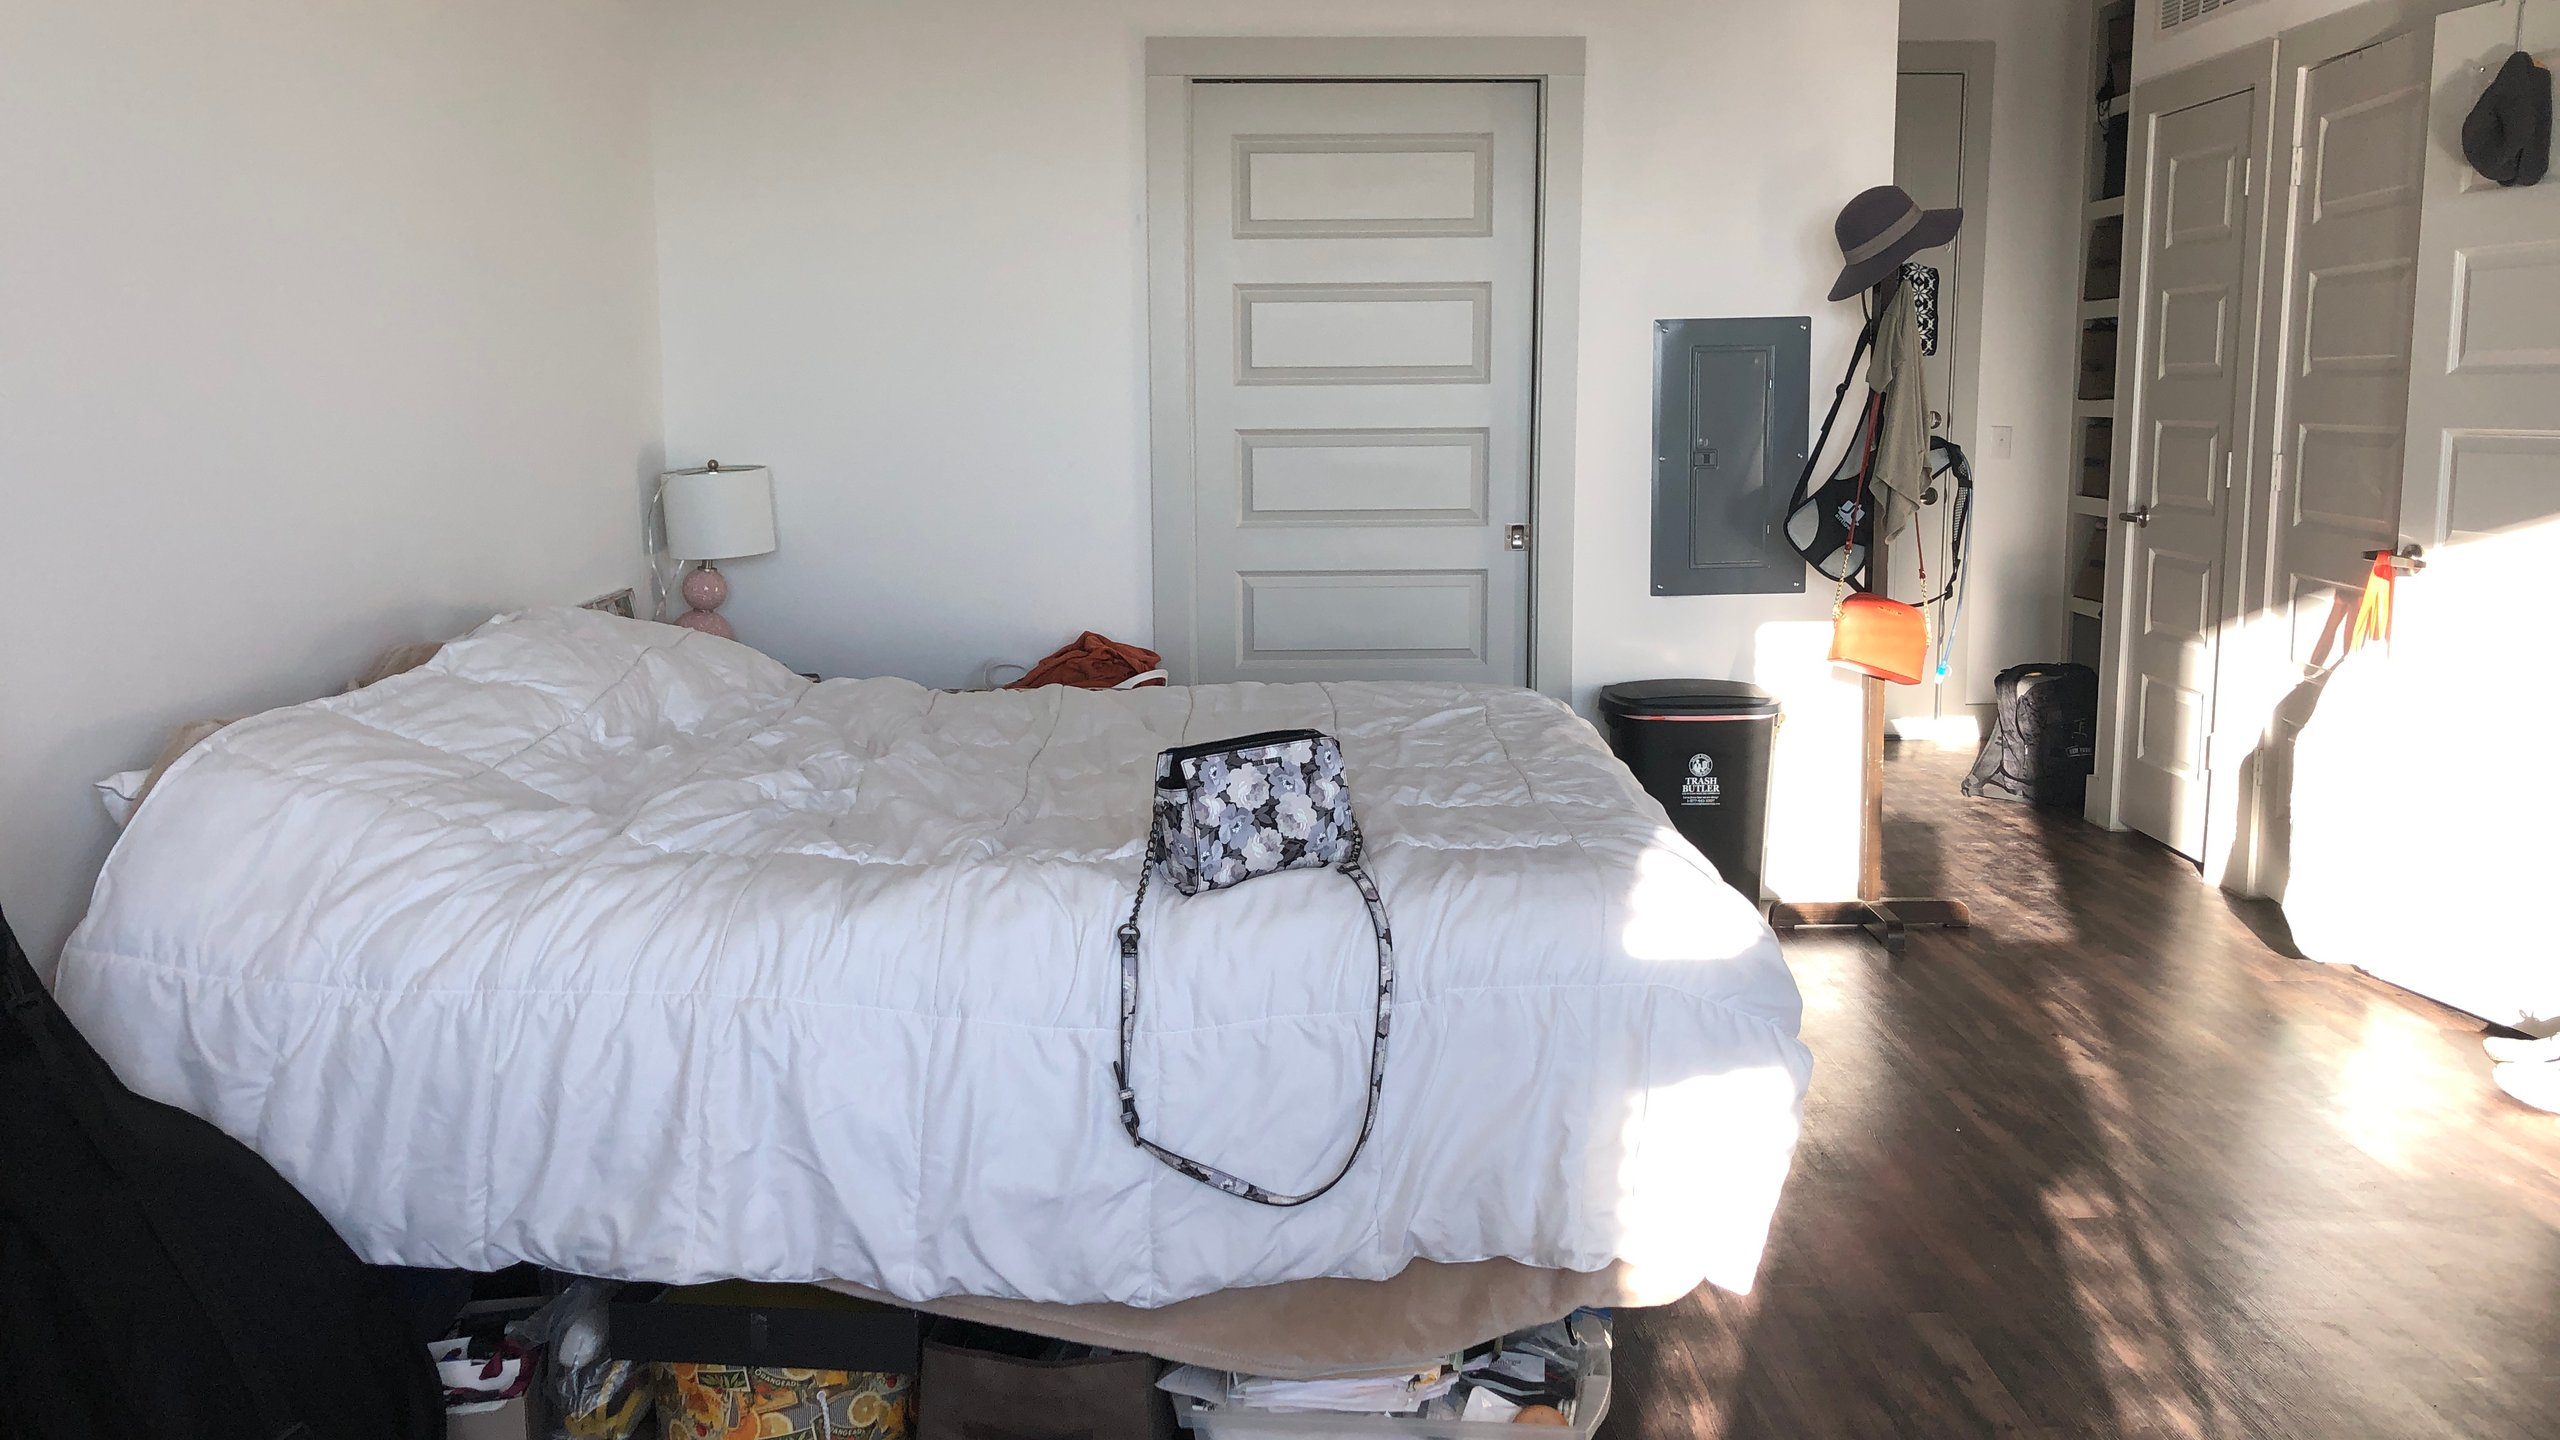 10x6 Bedroom self storage unit